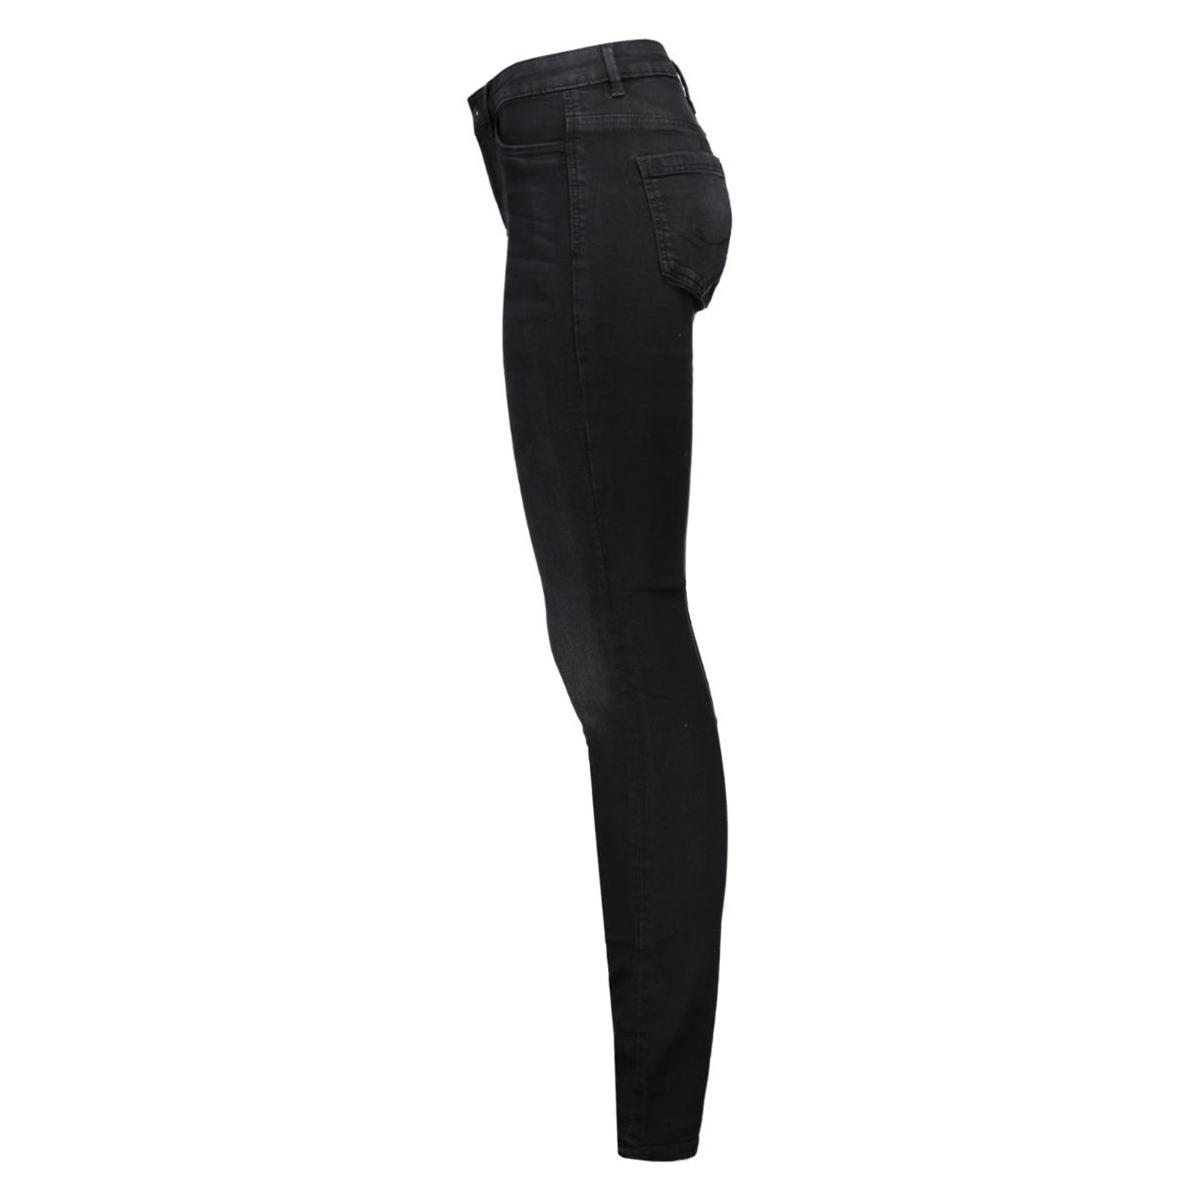 996cc1b904 edc jeans c910